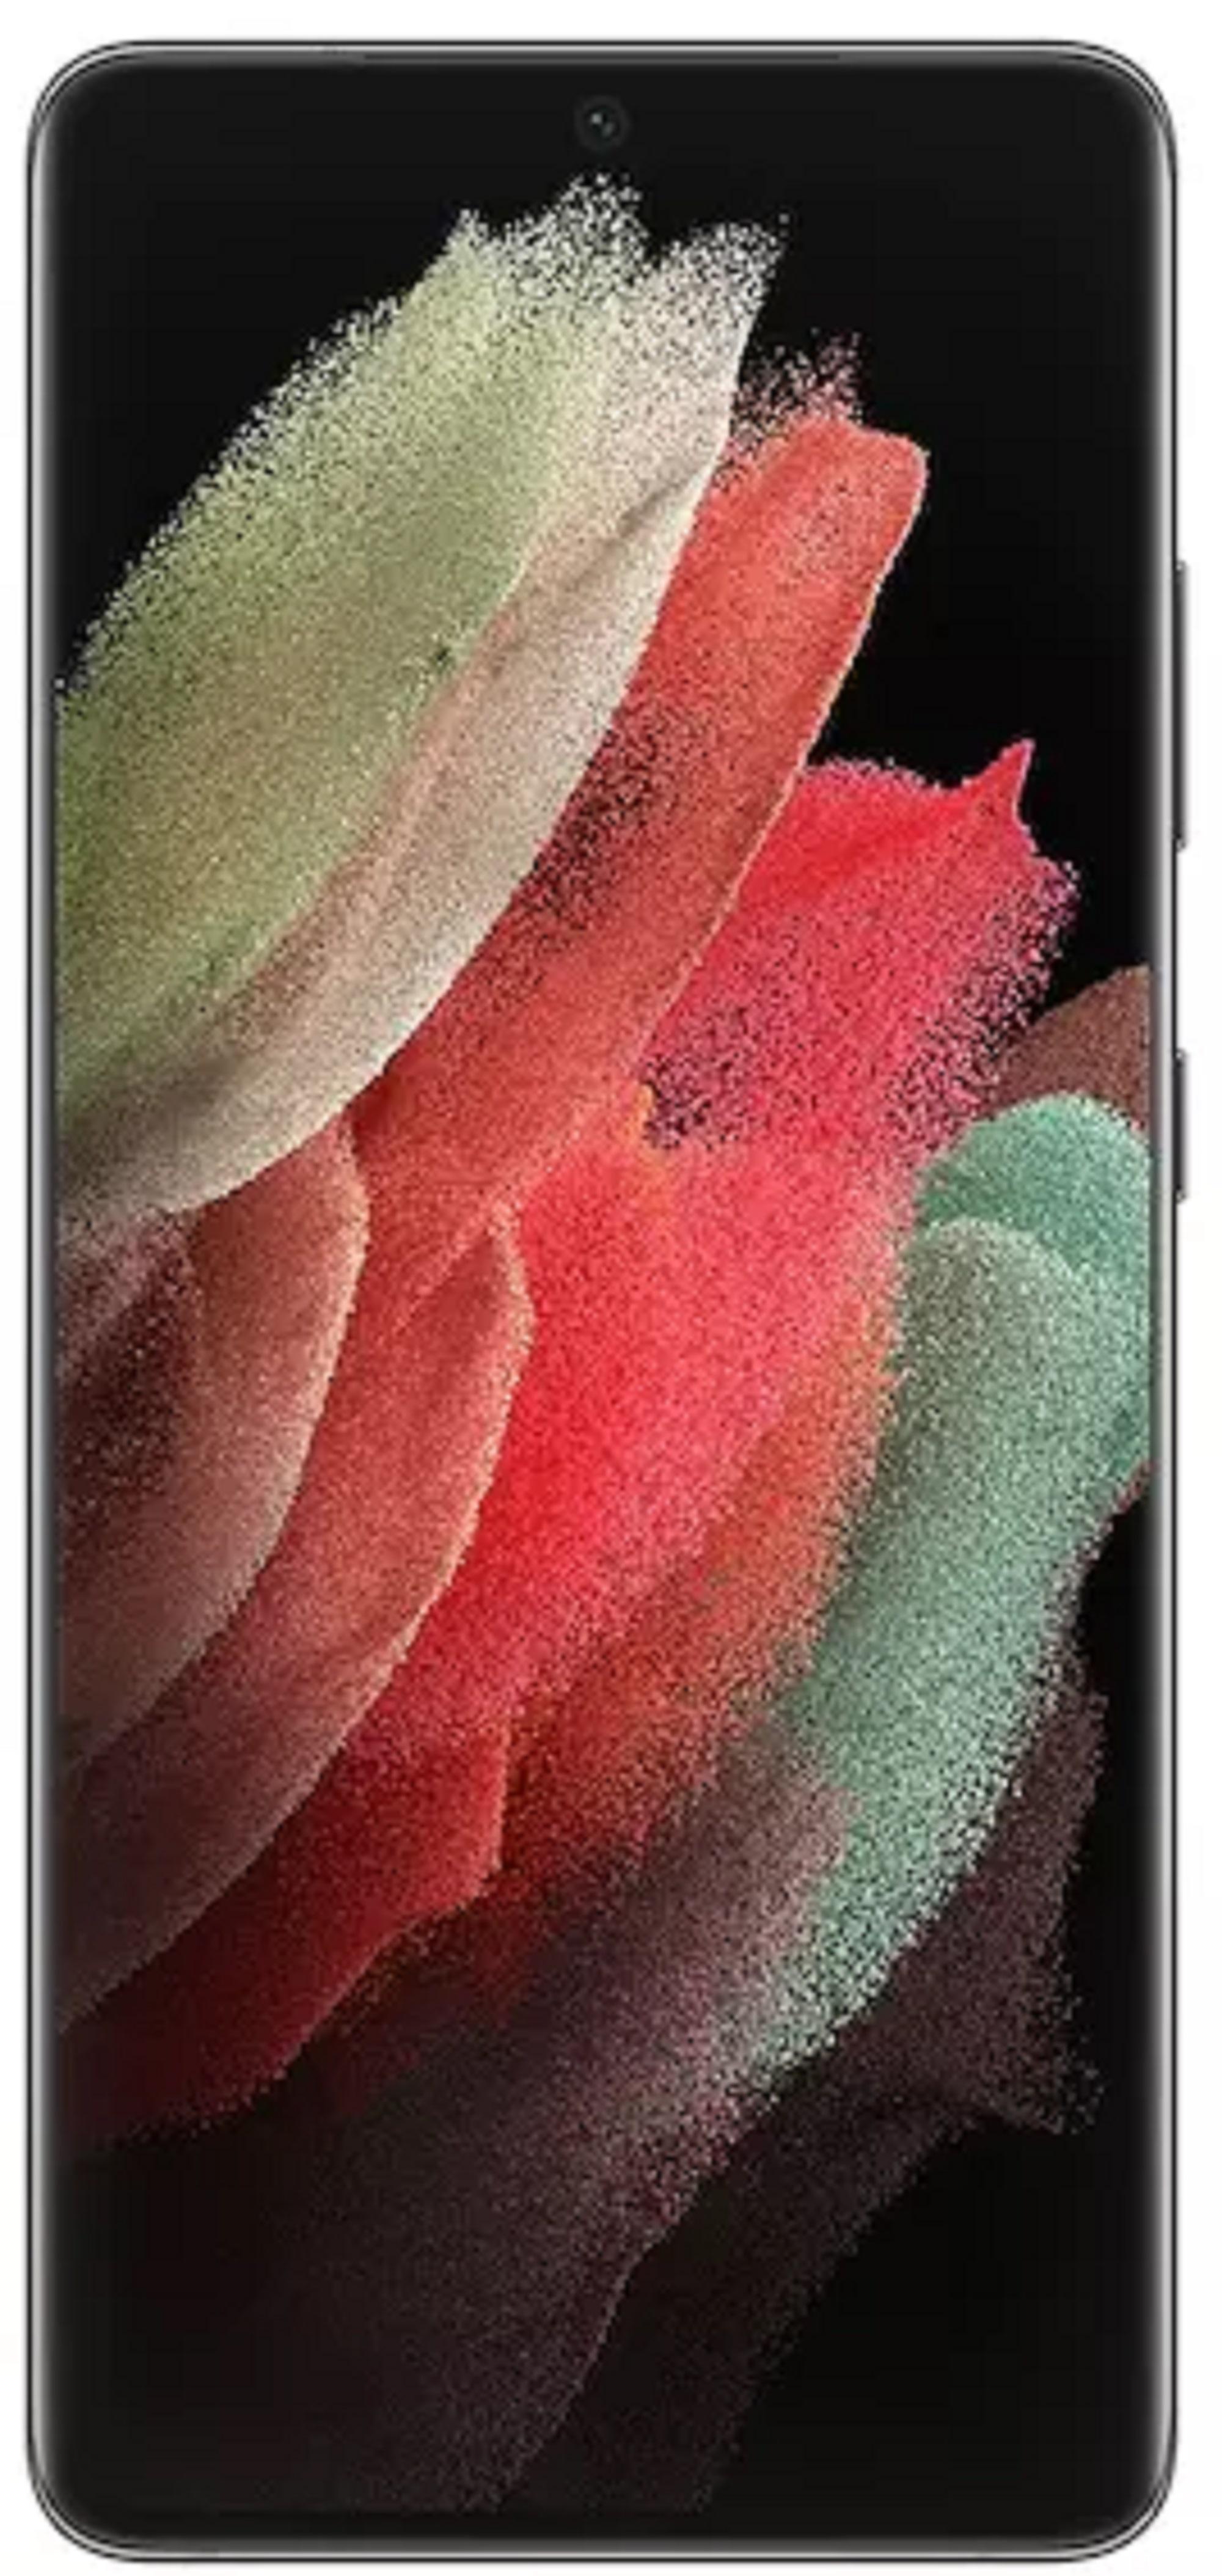 thumbnail 9 - Samsung Galaxy G998U S21 Ultra 5G 128GB Unlocked Smartphone - Excellent